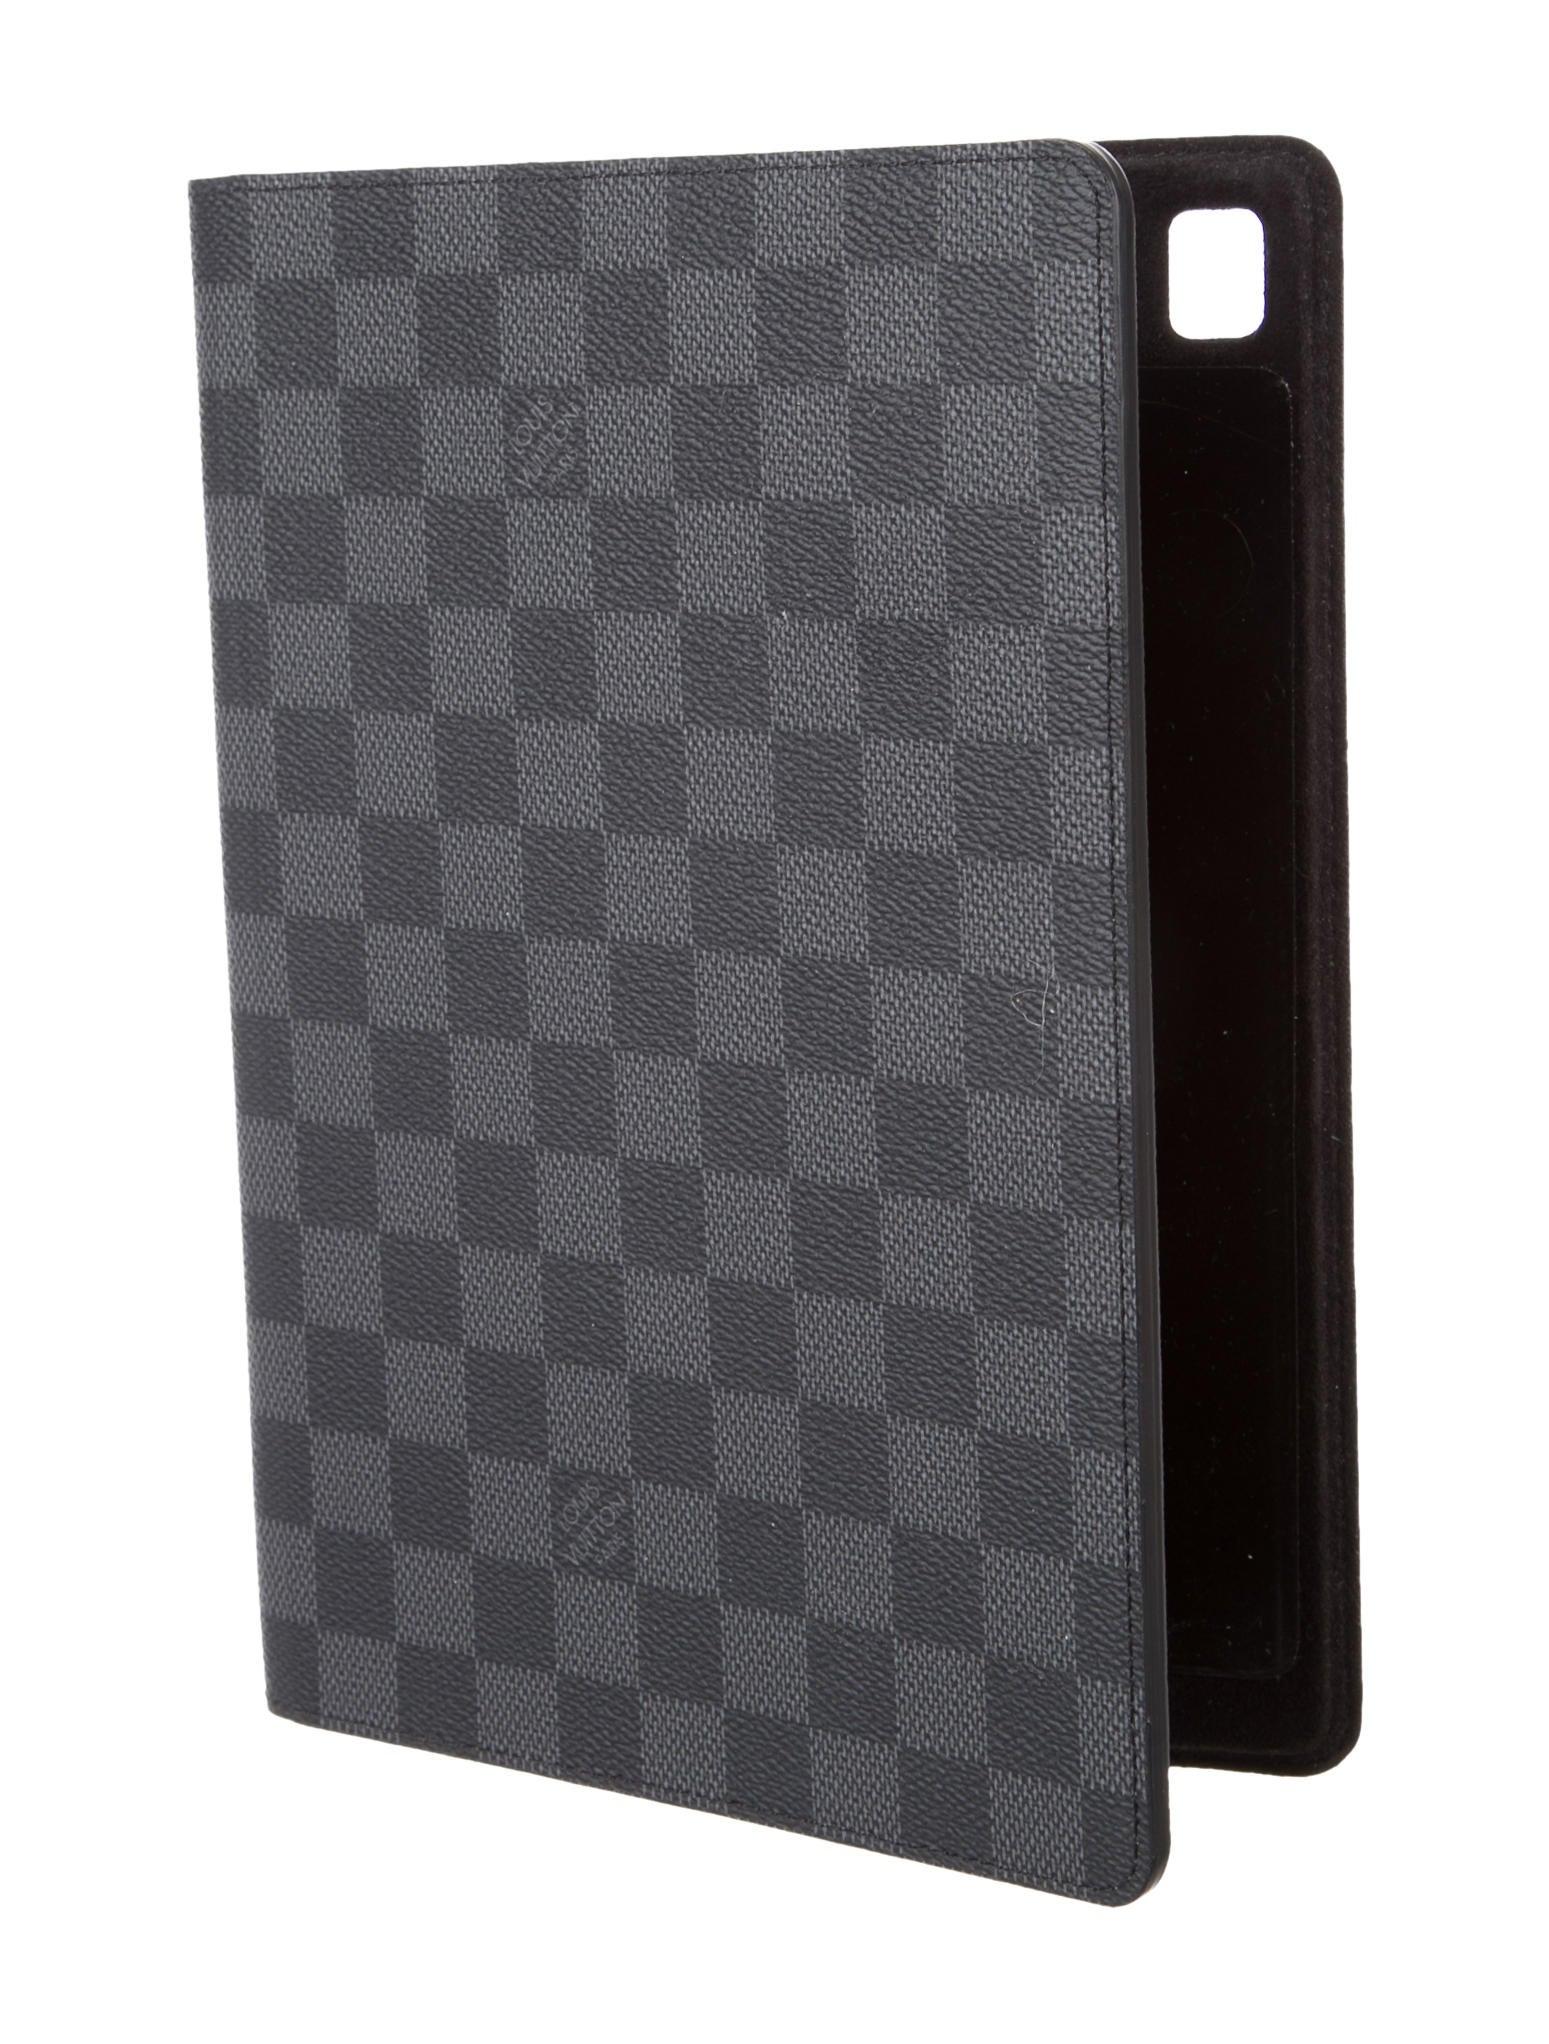 Louis Vuitton Damier Graphite Ipad Pro Folio Technology